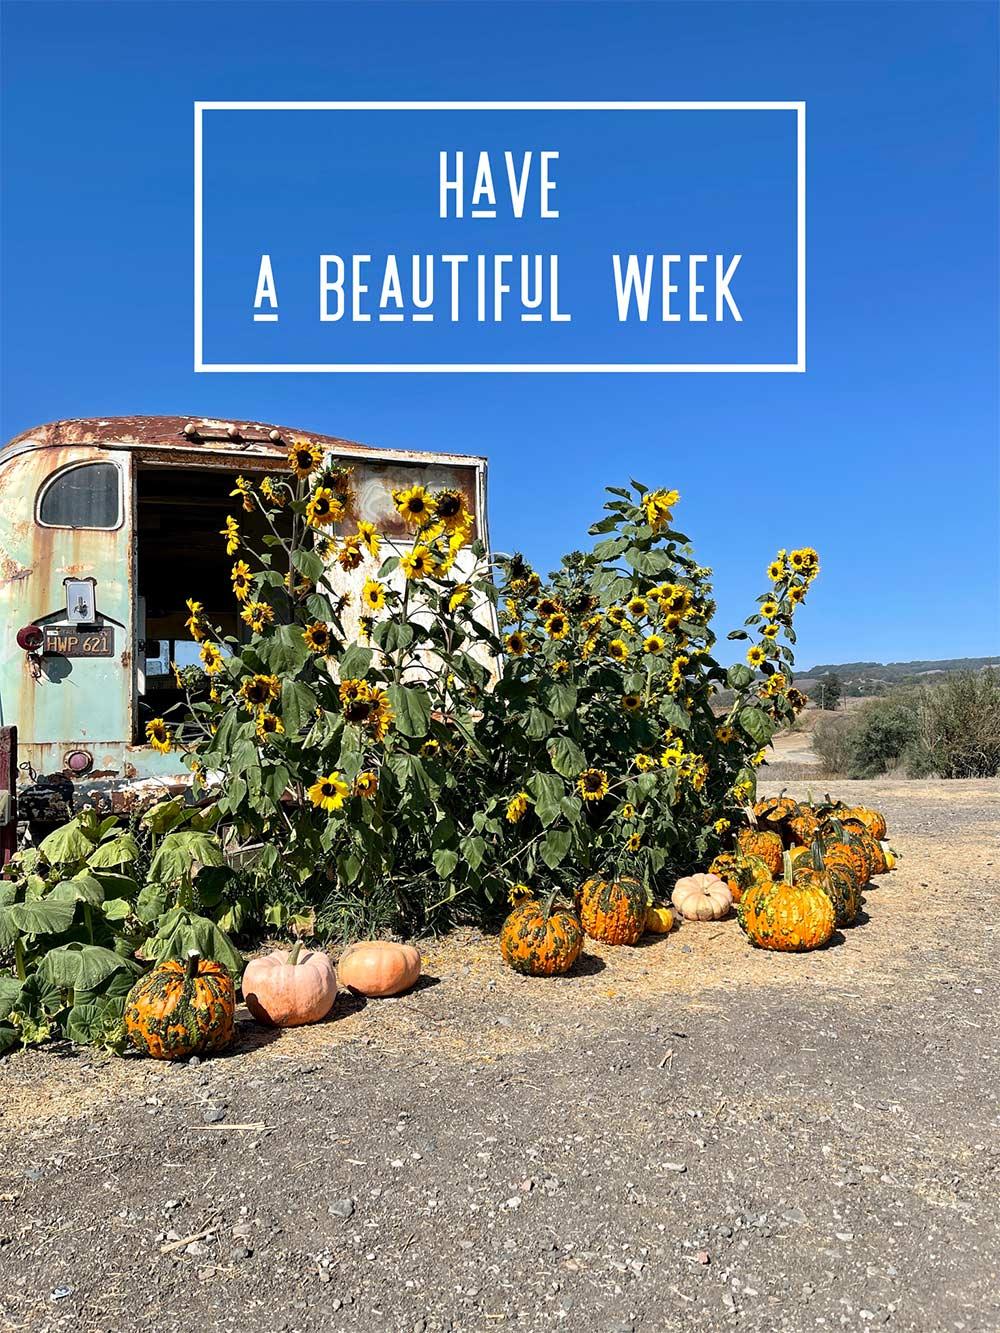 have a beautiful week fall pumpkins sunflowers bus